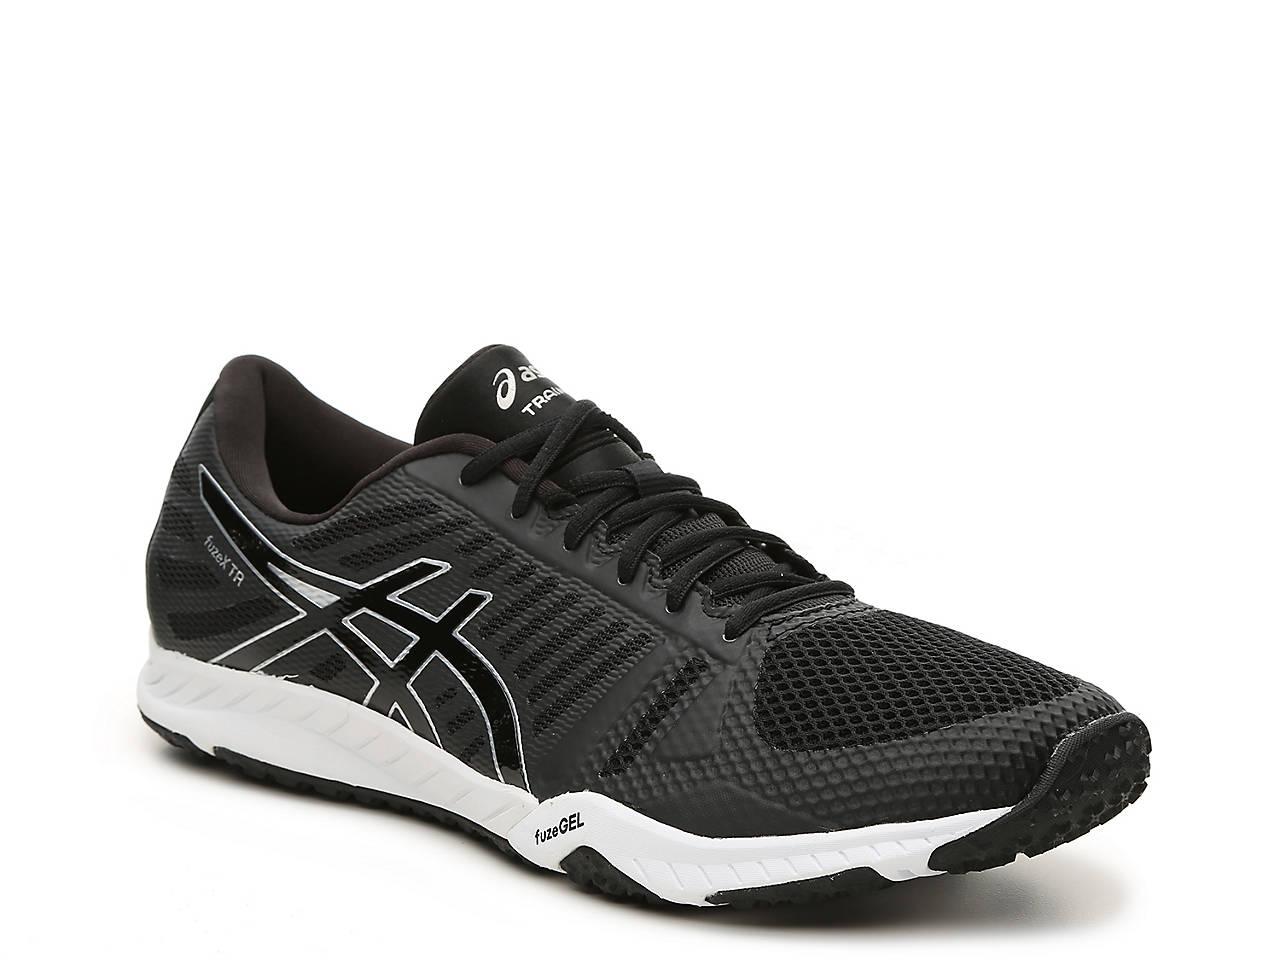 227e741575a8 ASICS FuzeX TR Training Shoe - Men s Men s Shoes